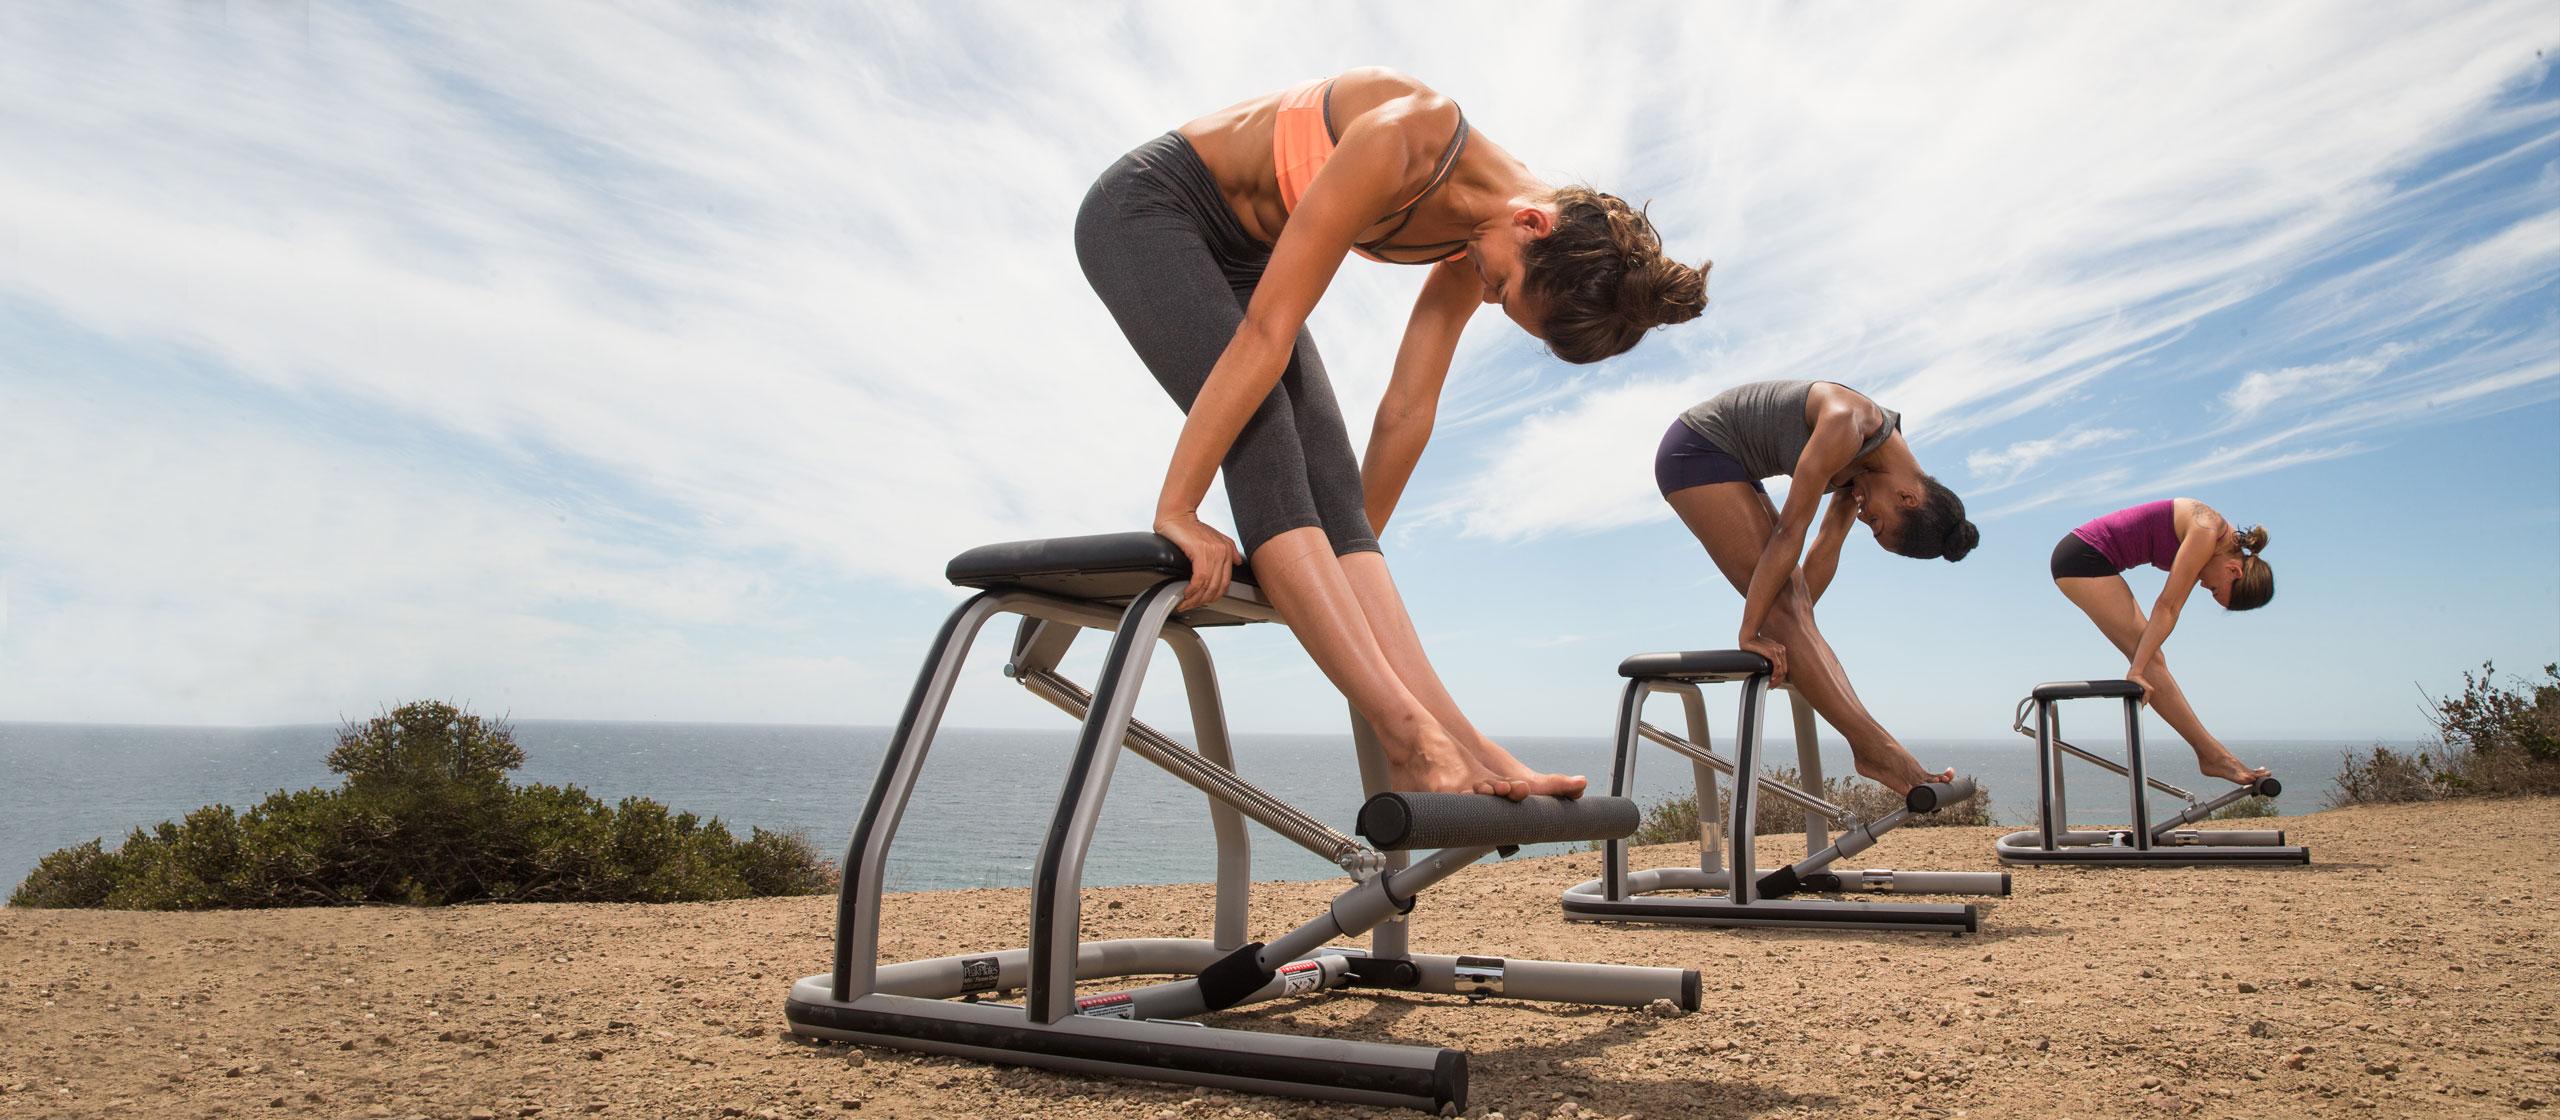 Balanced body pilates chair - Balanced Body Pilates Chair 43